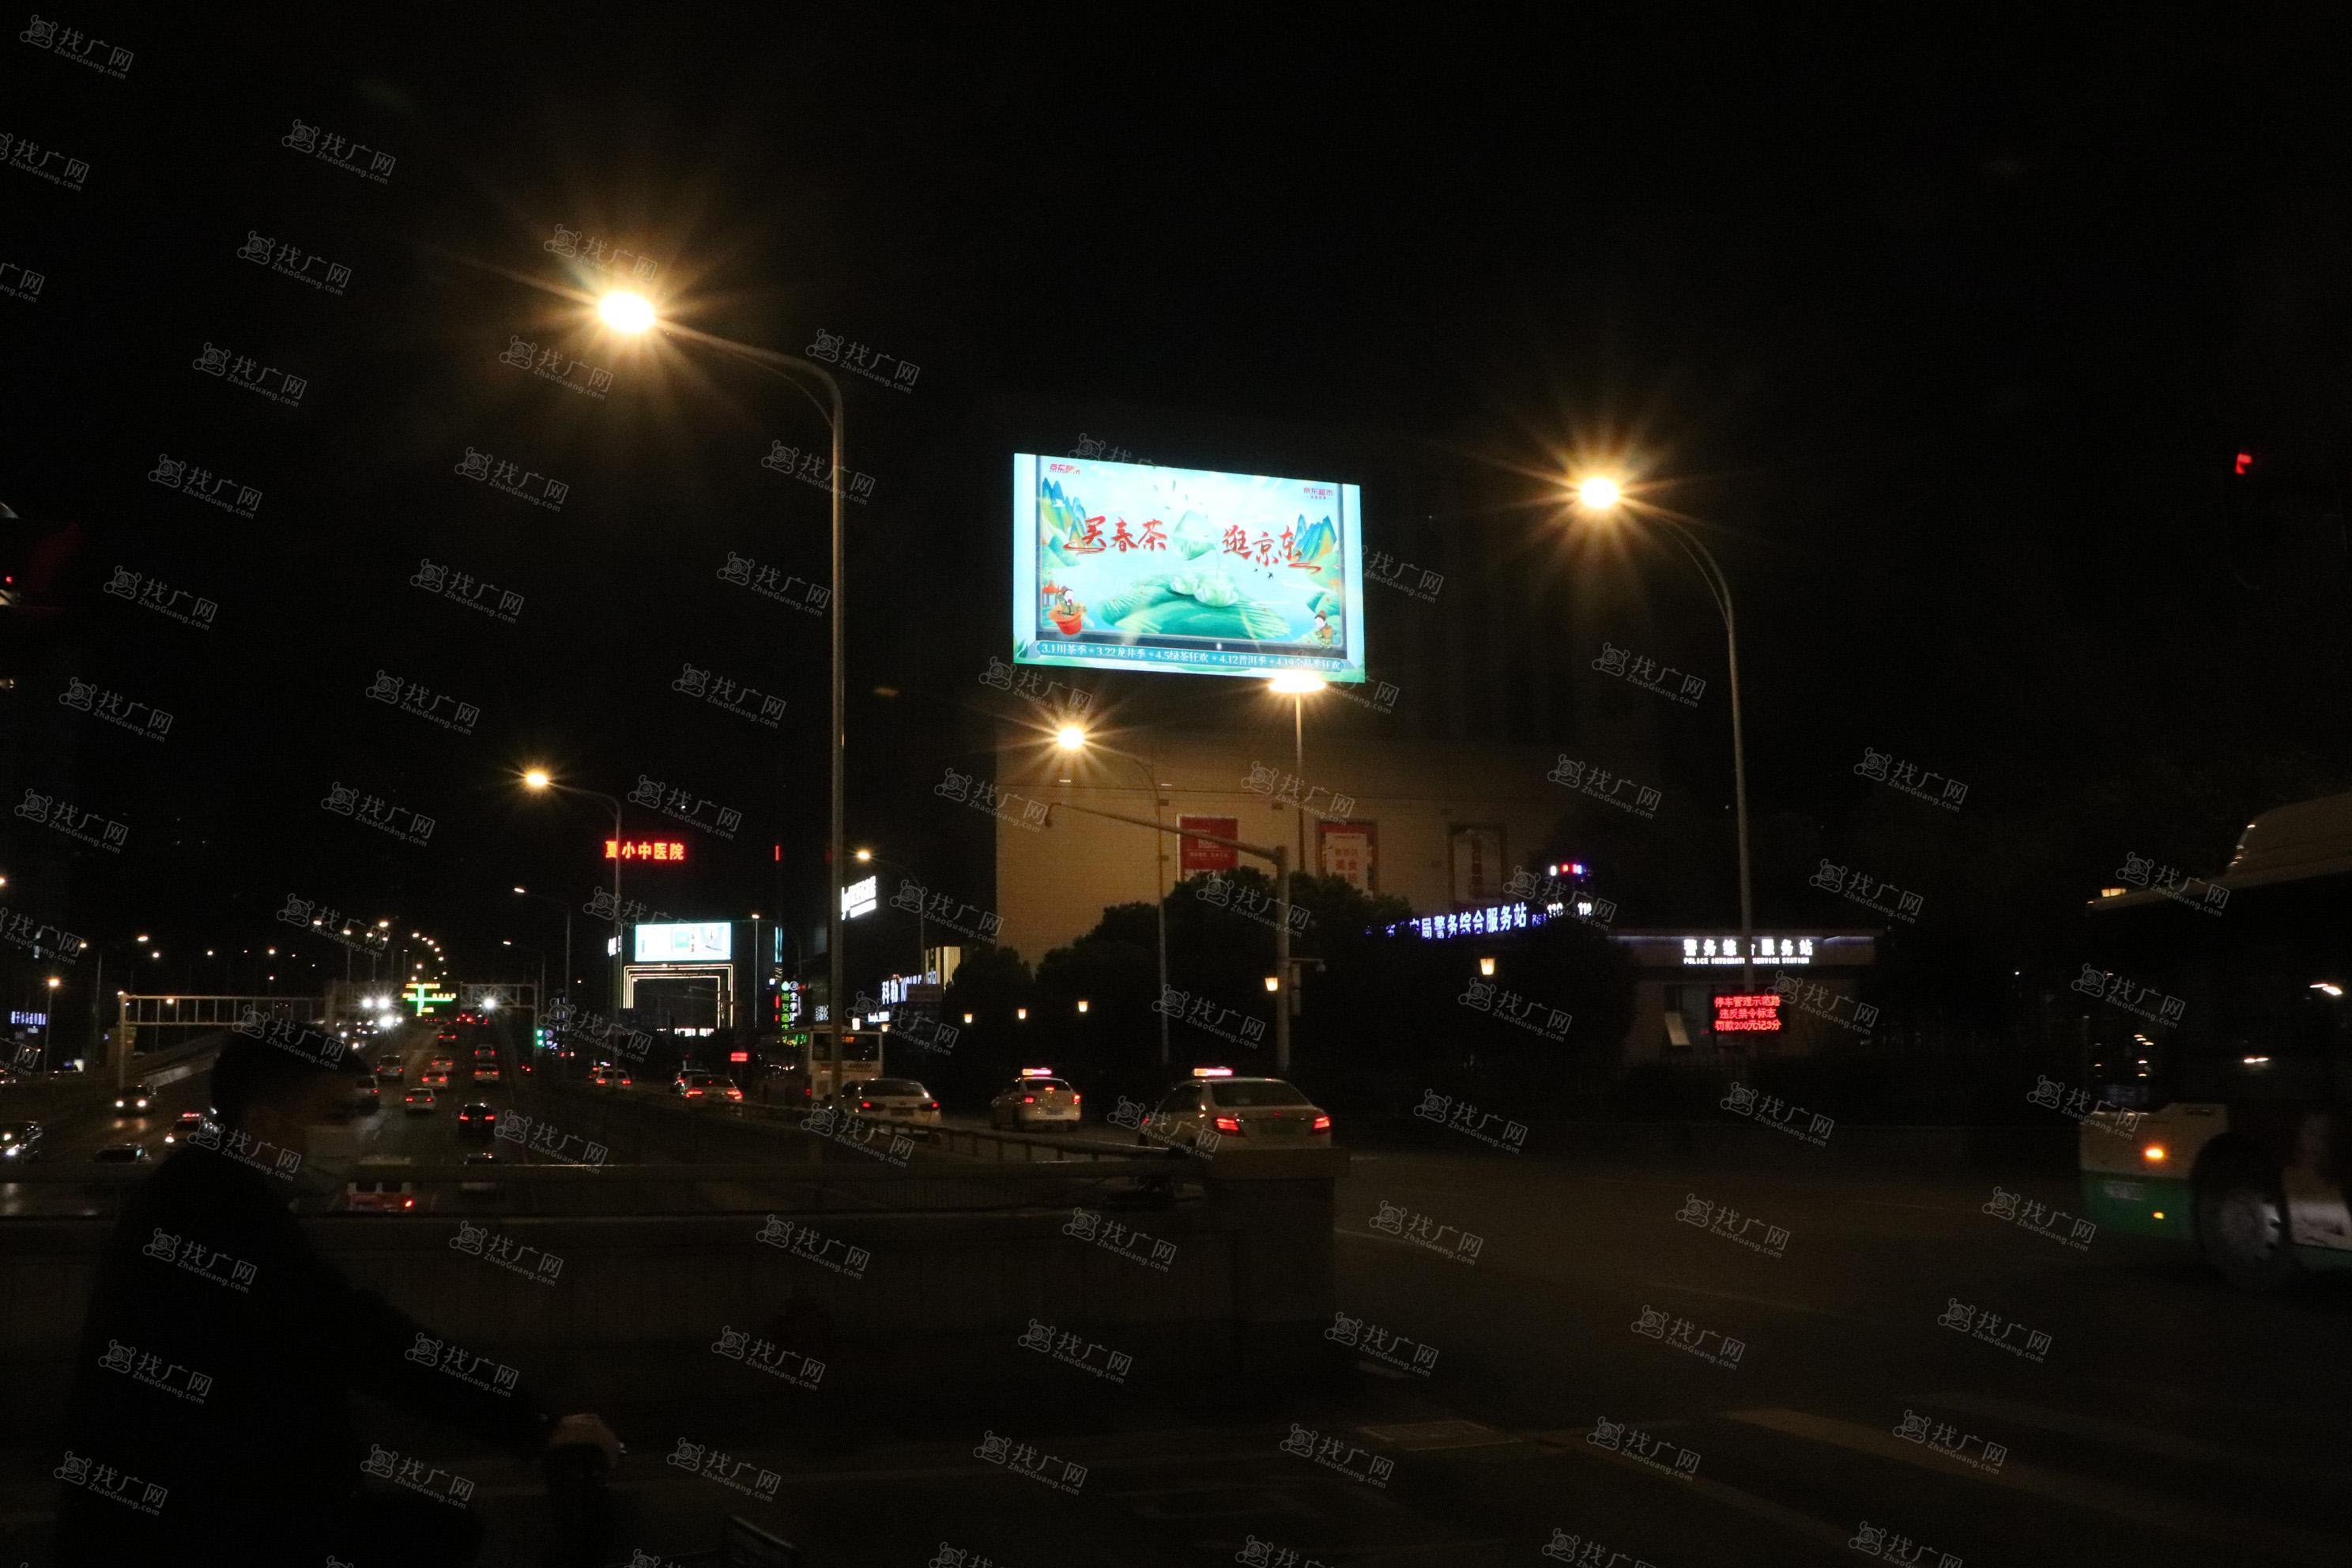 武汉商圈汉口欧亚达户外LED广告